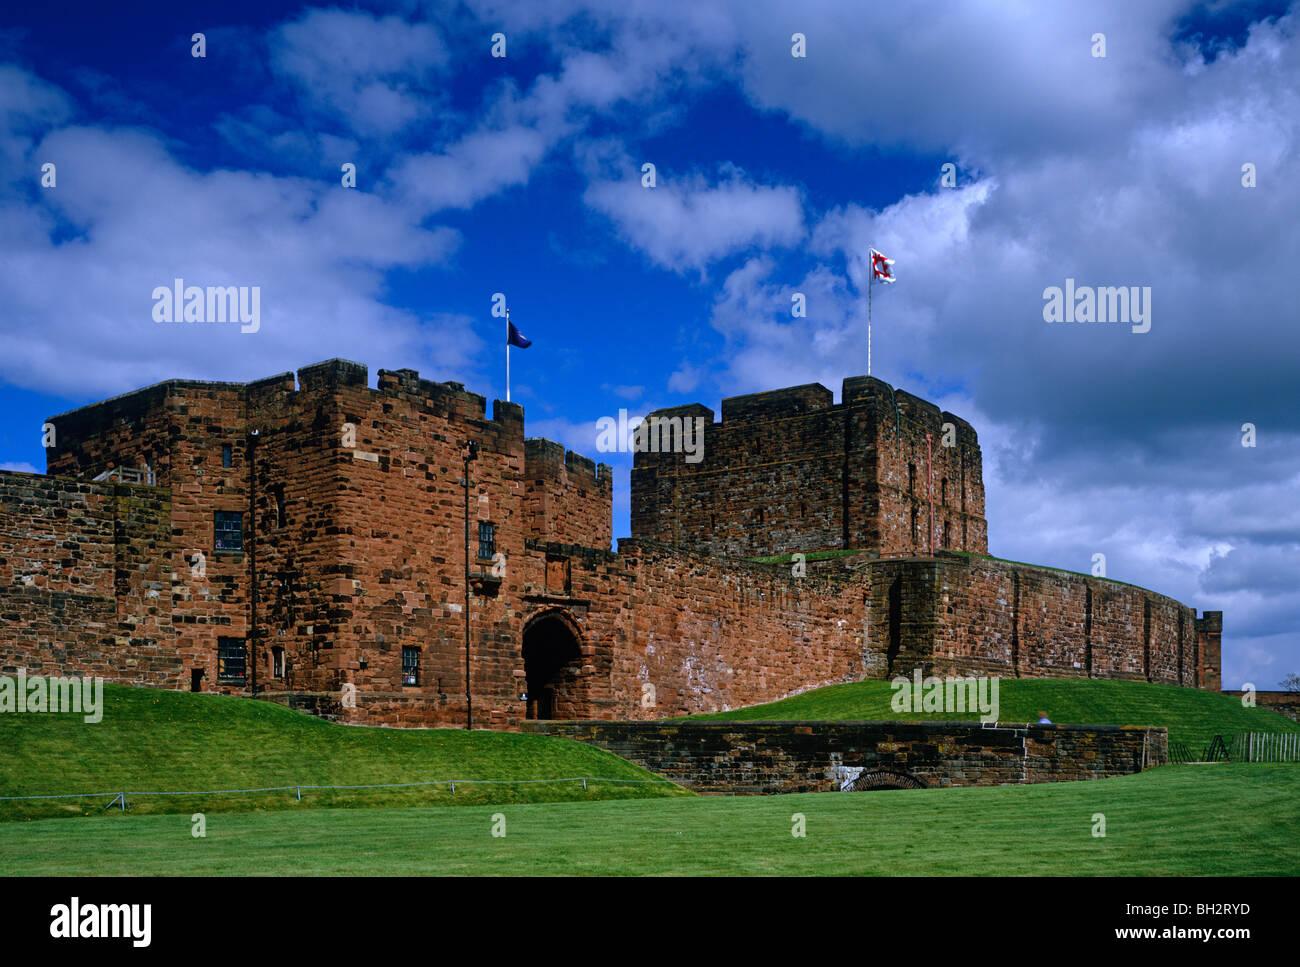 A view of the entrance to Carlisle Castle, Carlisle, Cumbria - Stock Image